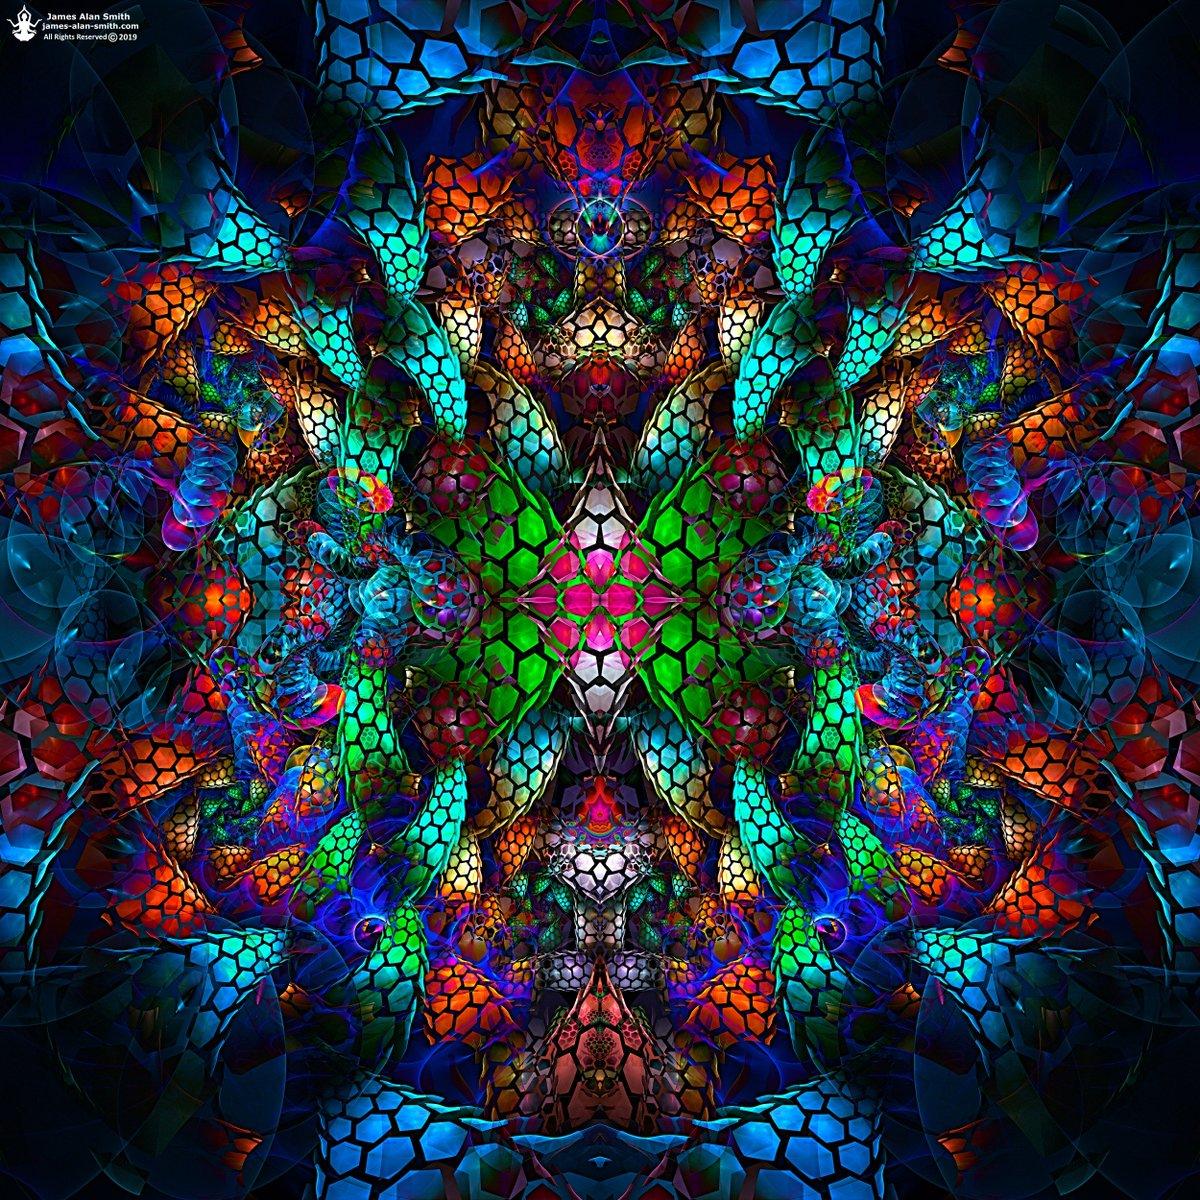 Uplifted Spirit: A new meditation abstraction I finished today... #art #digitalart #abstractart #meditation https://t.co/6qXMlEp484